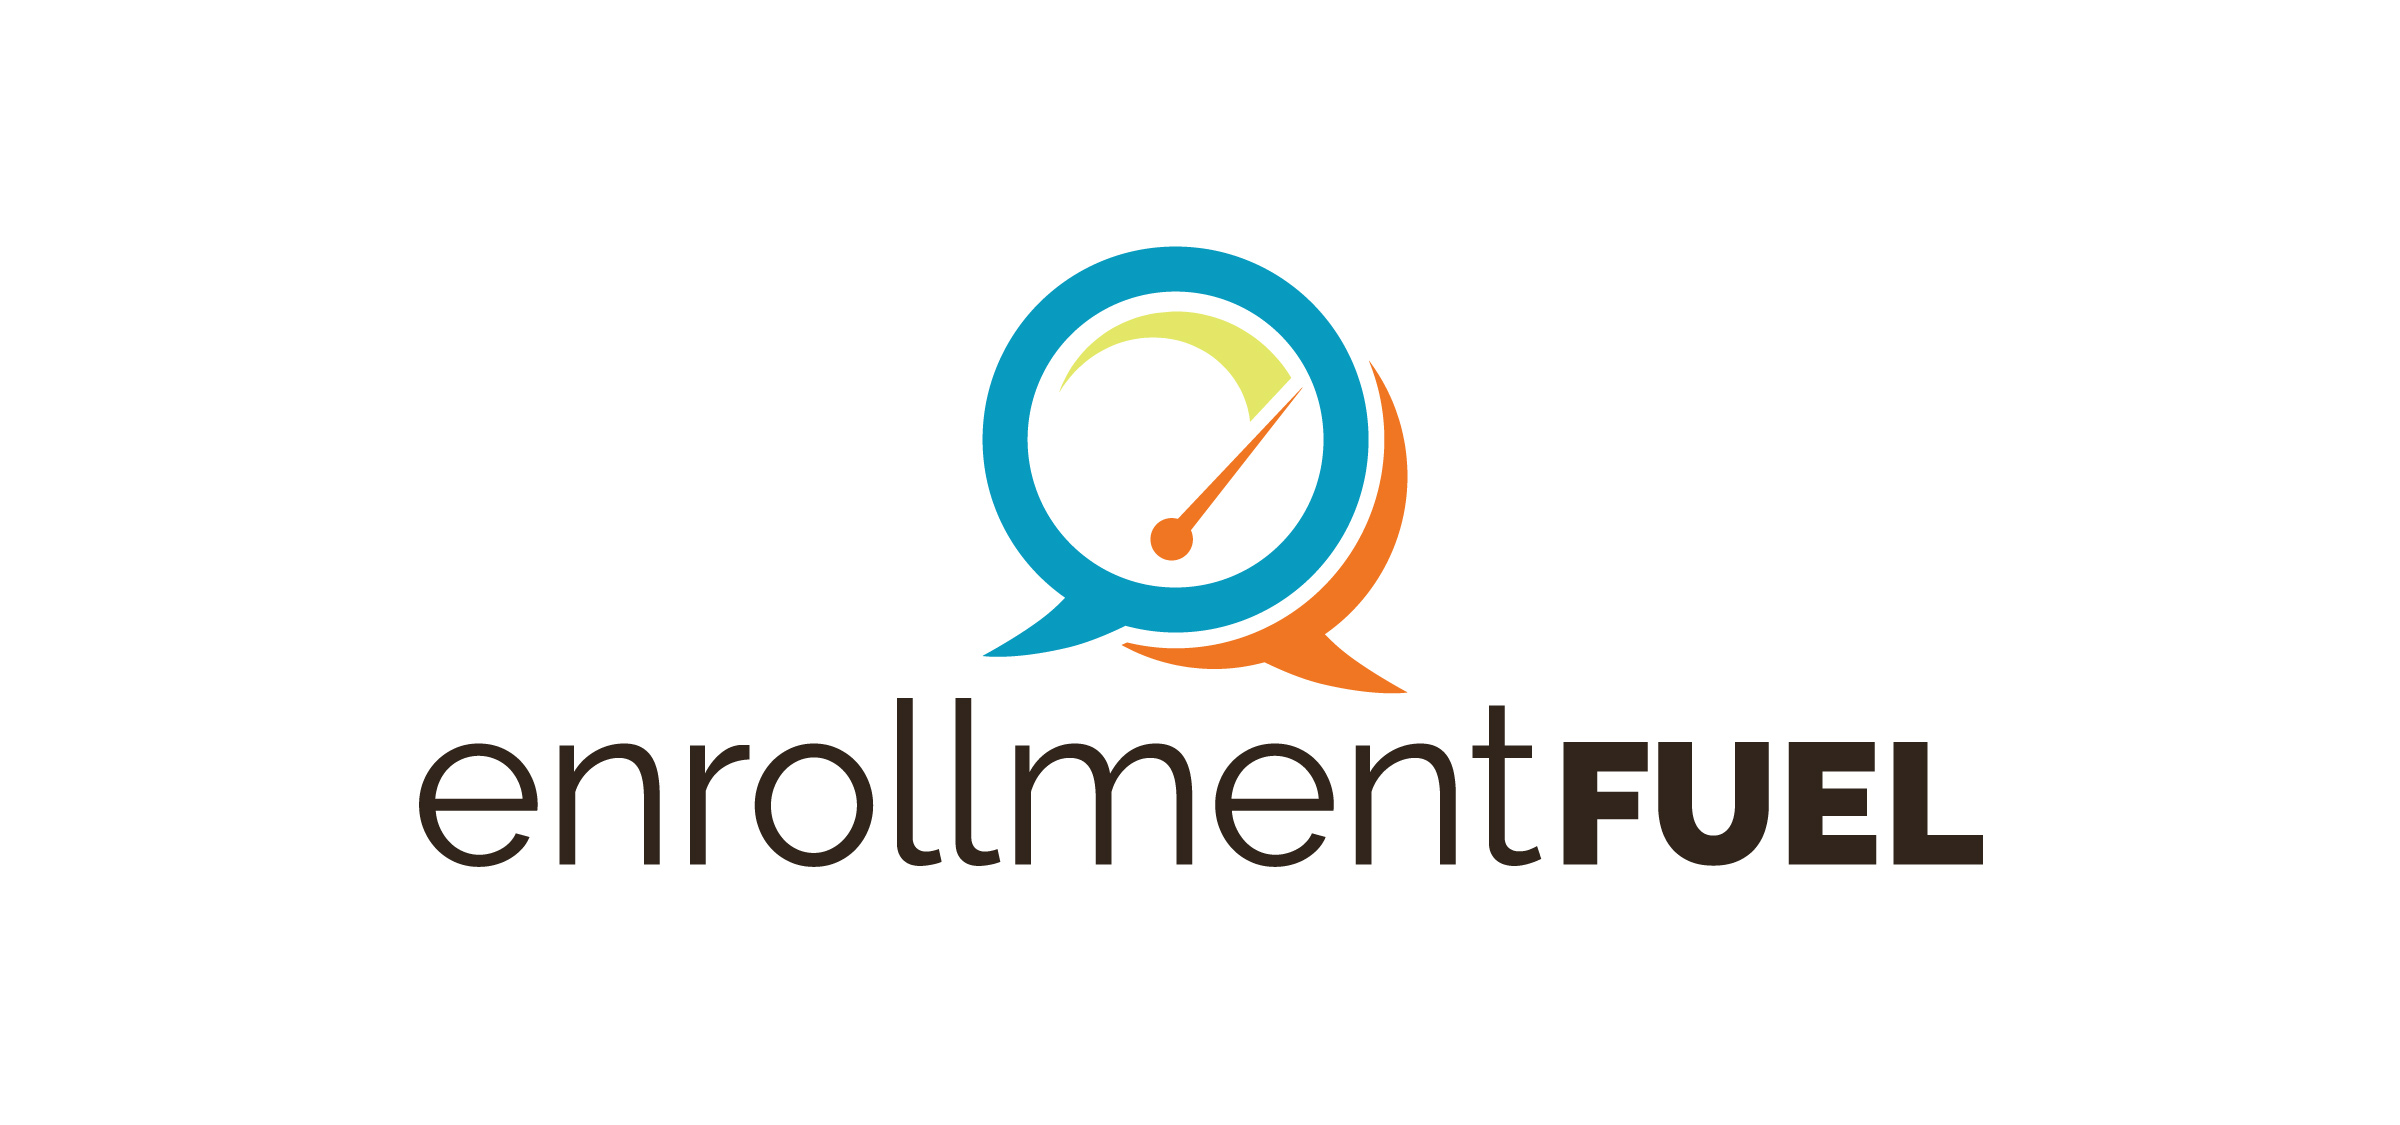 enrollmentFUEL